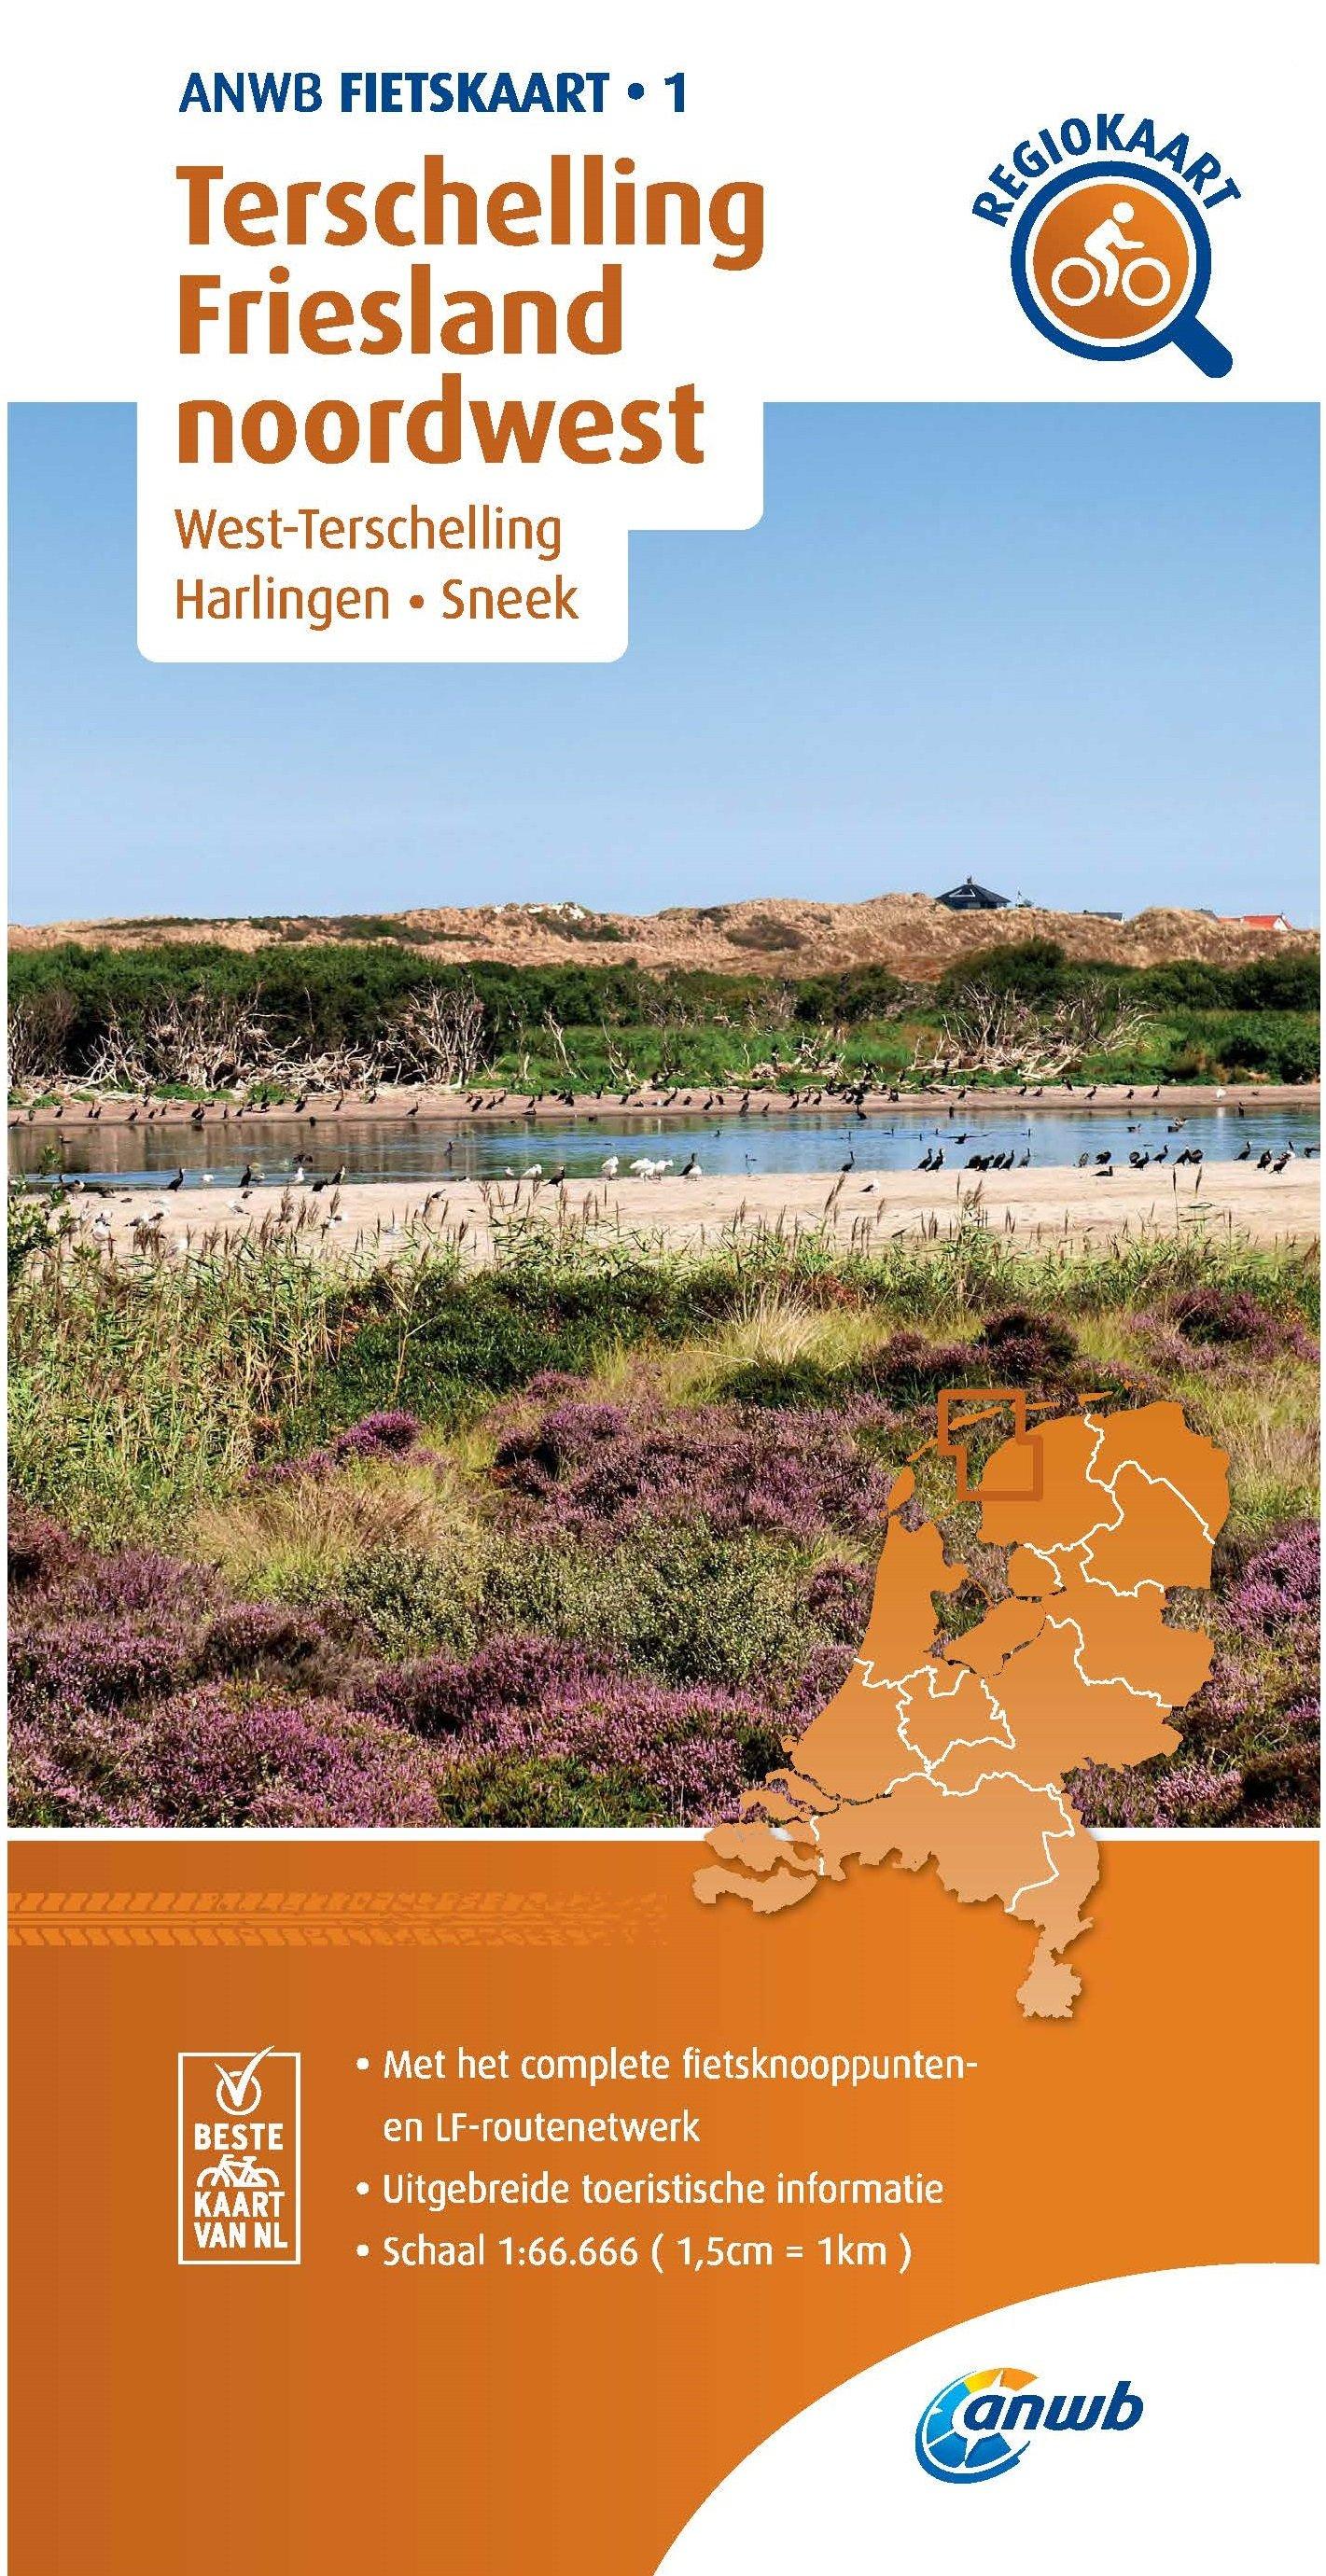 AF-01 Terschelling / Friesland noordwest | ANWB fietskaart 1:66.666 9789018047023  ANWB ANWB fietskaarten 1:66.666  Fietskaarten Friesland, Waddeneilanden en Waddenzee